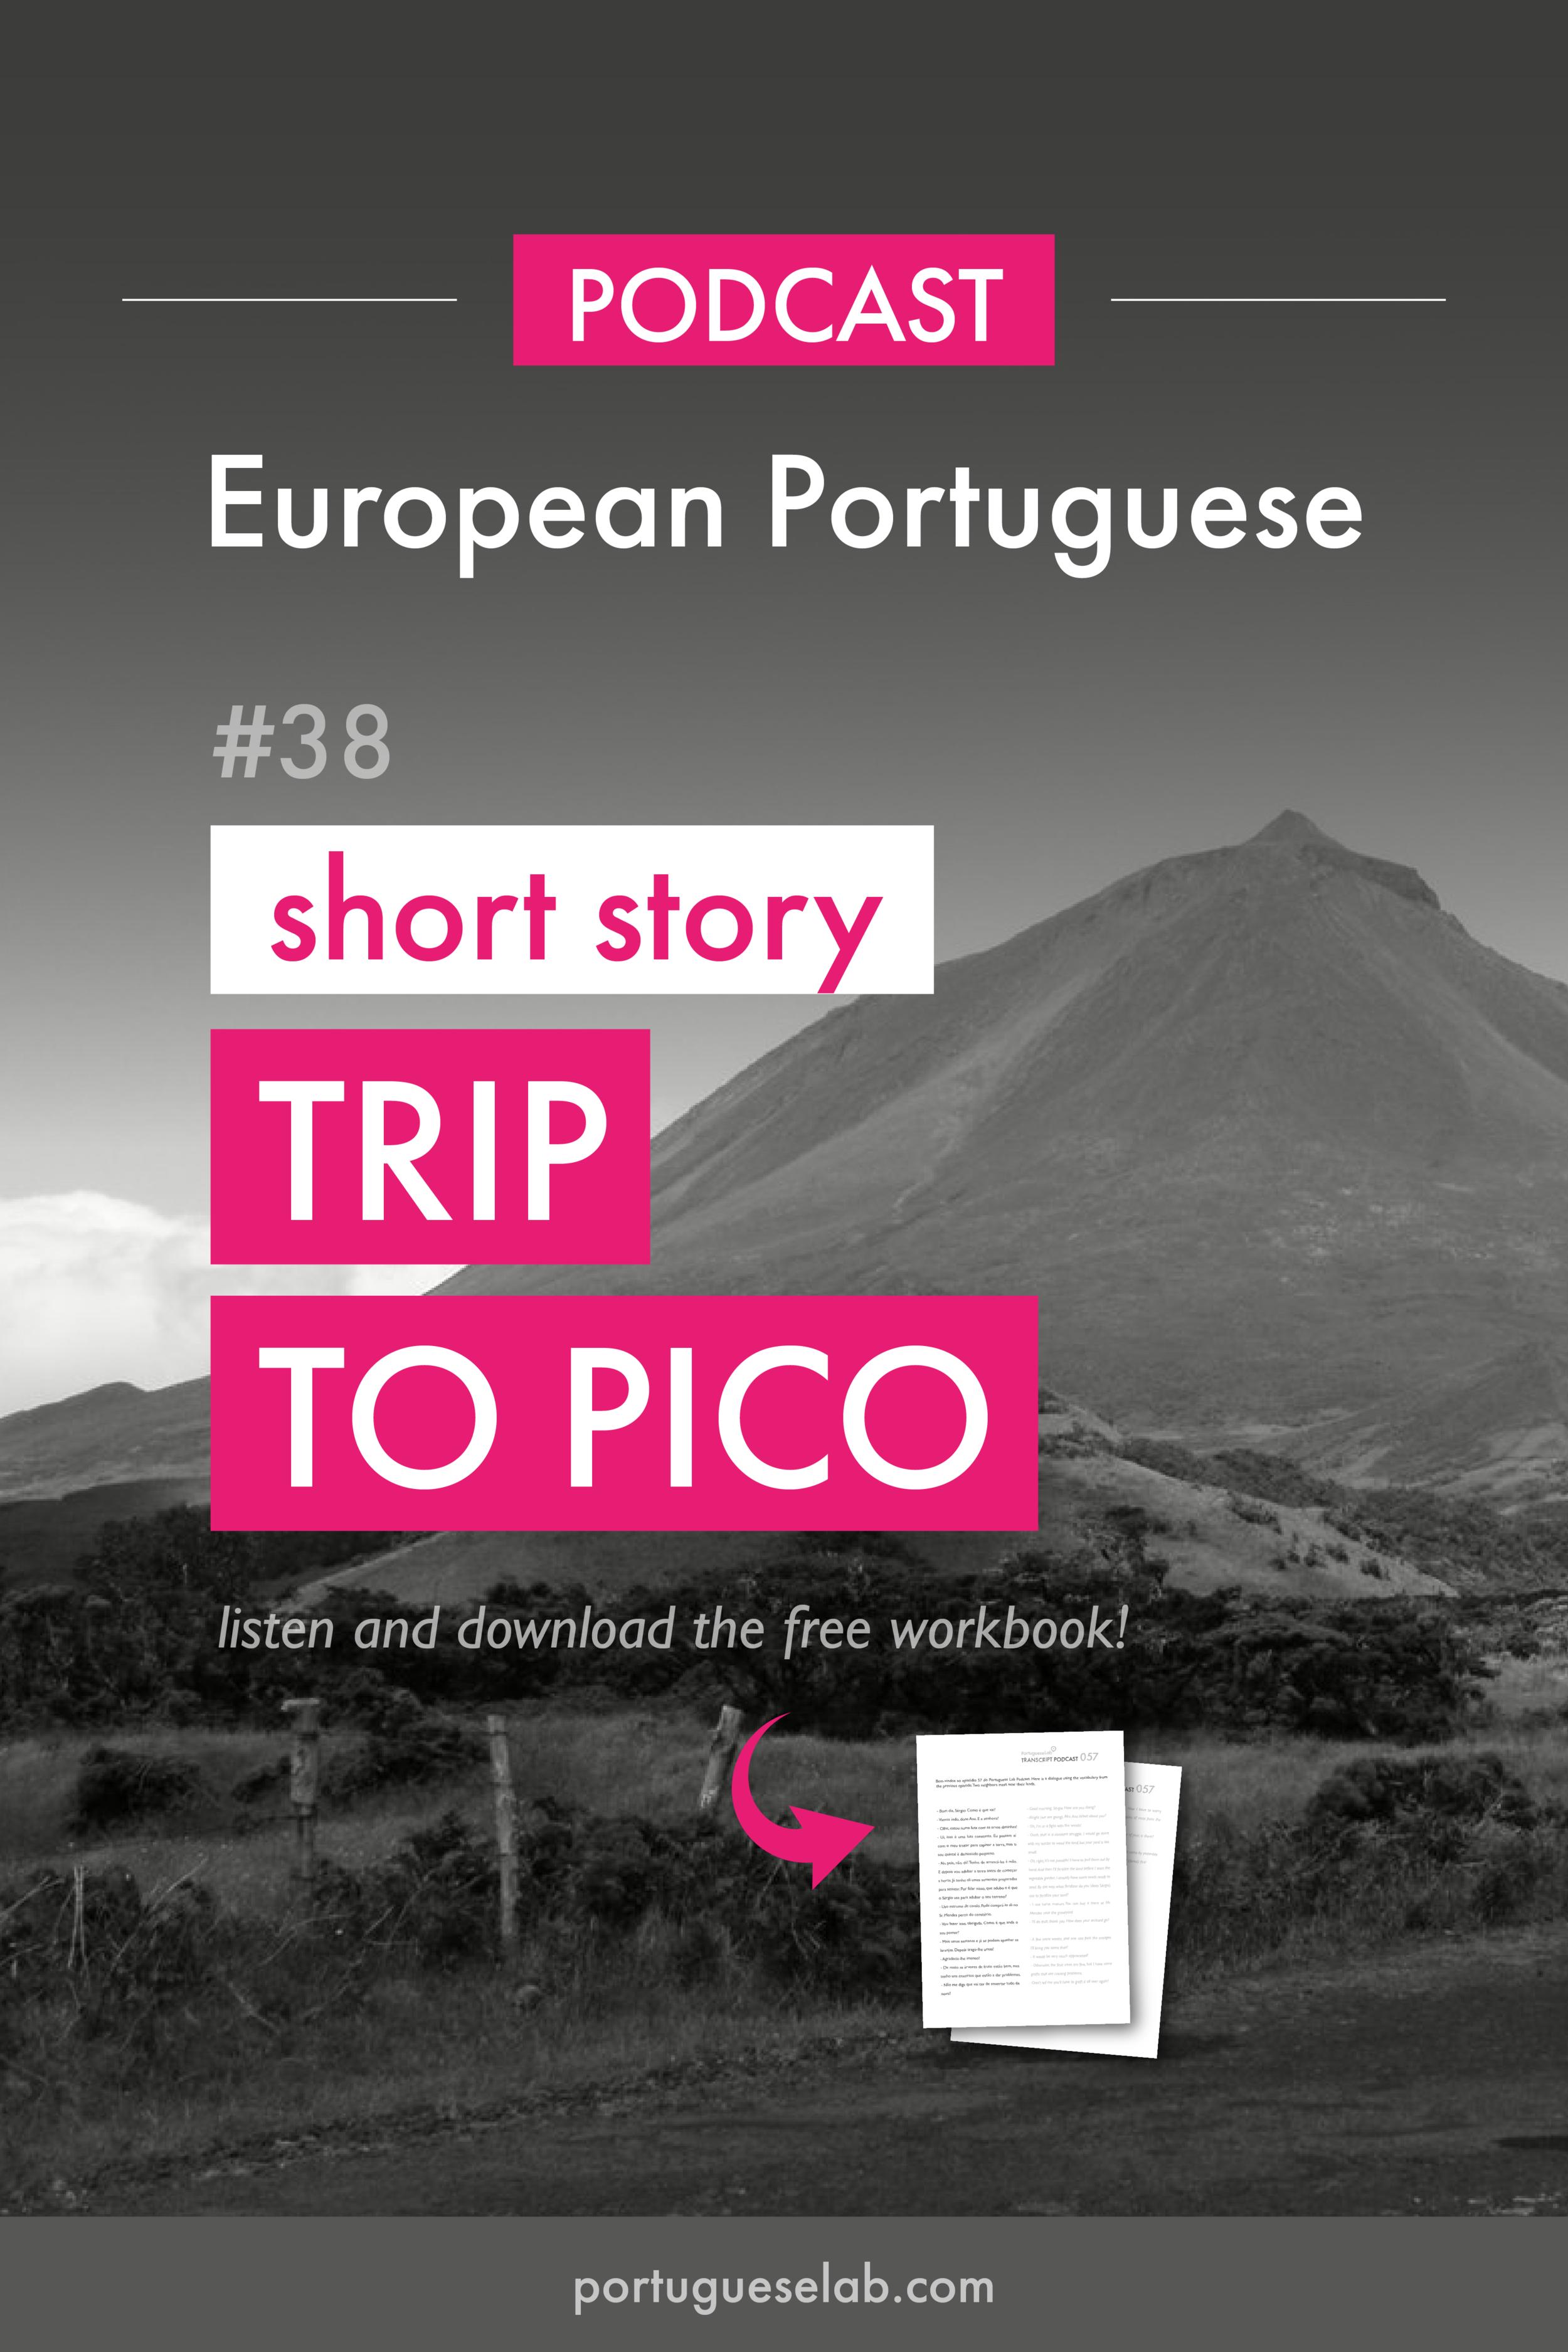 Portuguese Lab Podcast - European Portuguese - 38 - Trip to Pico - short story.png